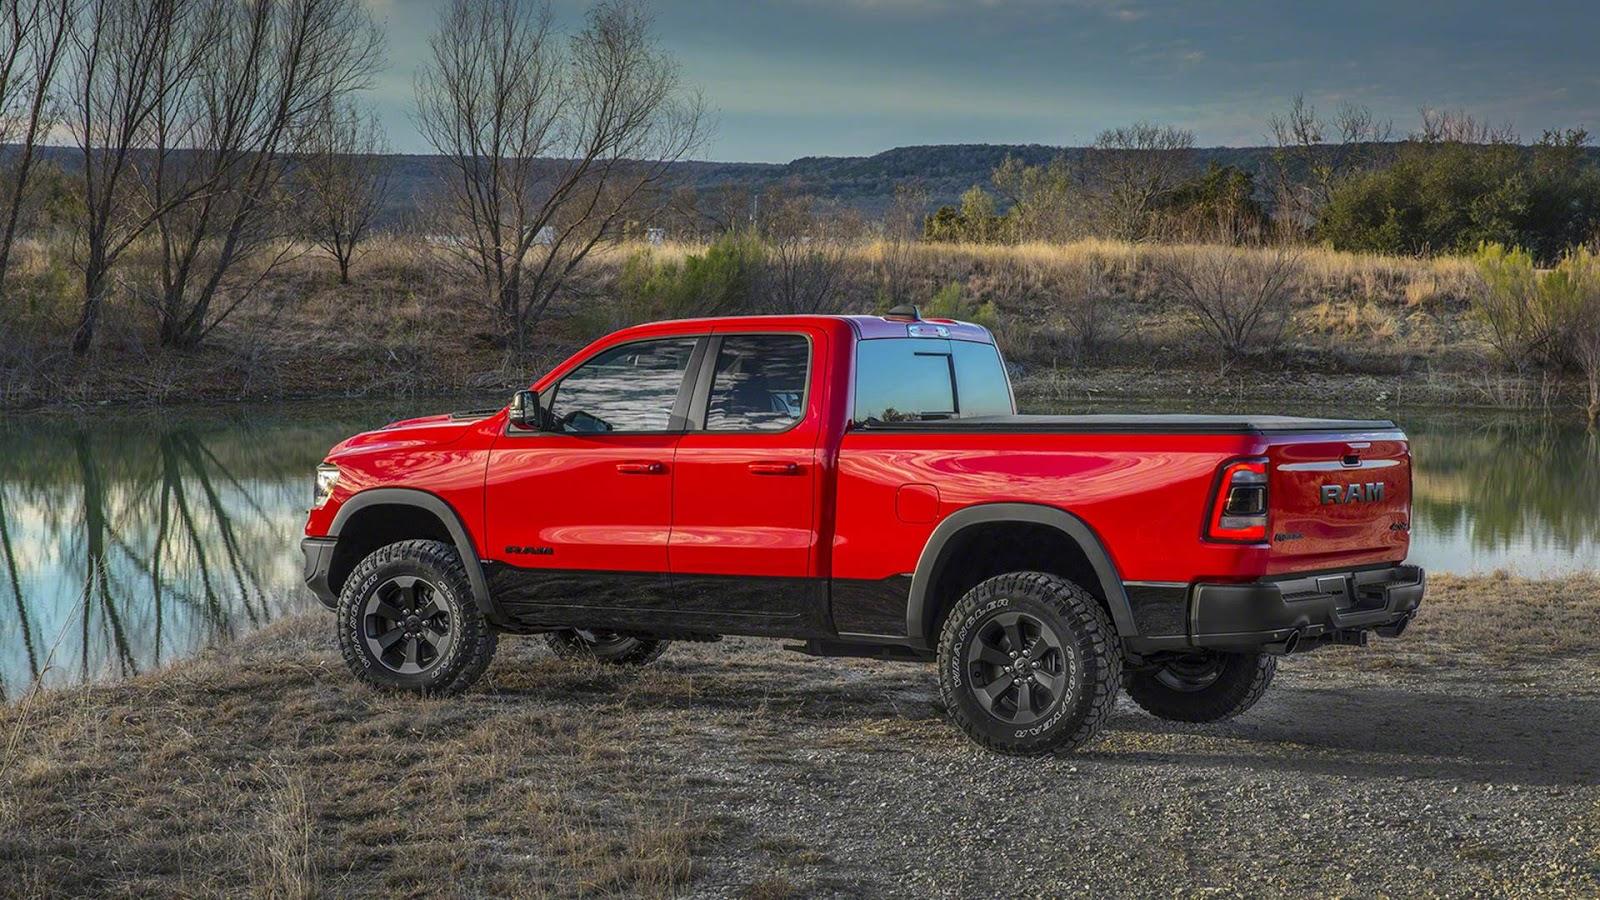 Diesel Jeep Wrangler >> 2020 Ram 1500 To Share New EcoDiesel V6 With Jeep Gladiator Pickup, Wrangler SUV - autoevolution